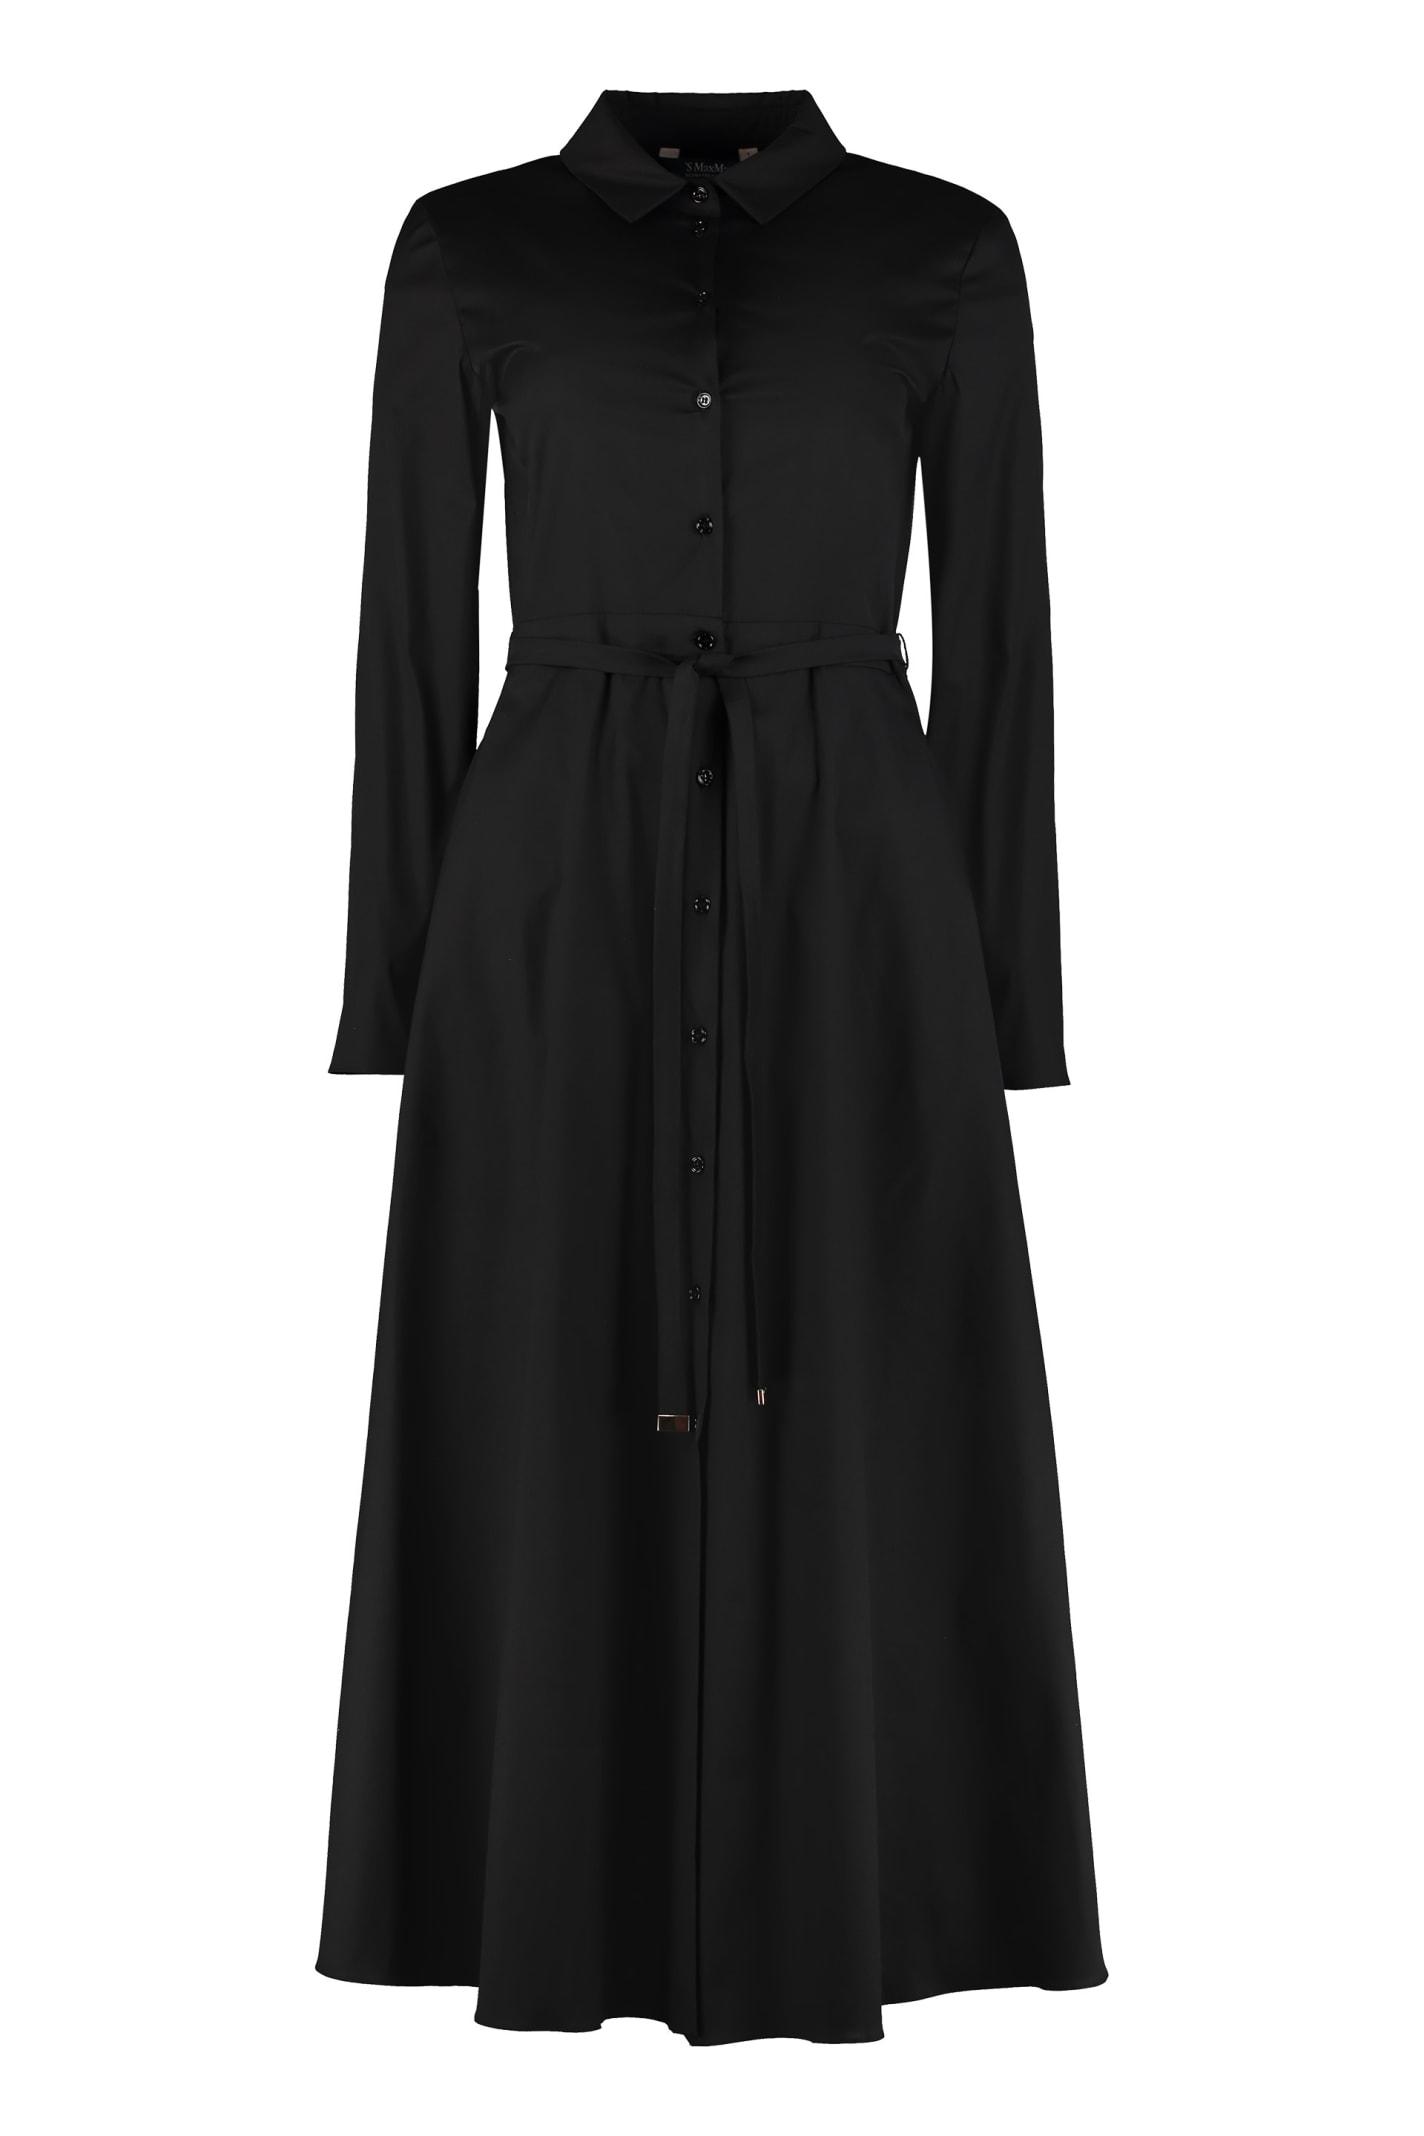 Buy S Max Mara Vernice Cotton Shirtdress online, shop S Max Mara with free shipping